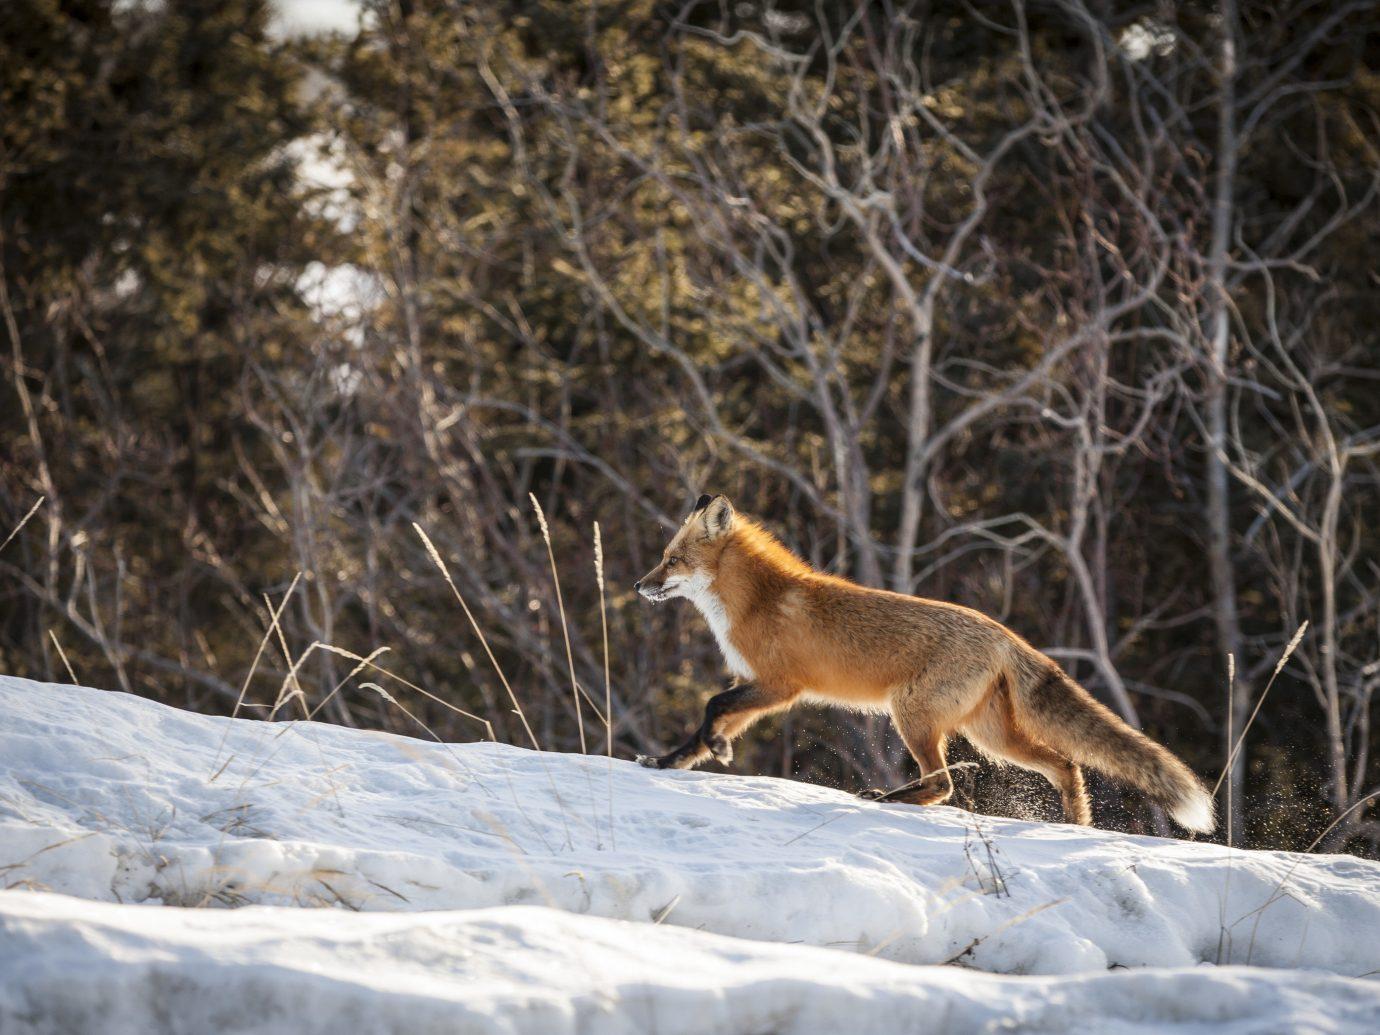 Travel Tips snow tree mammal animal outdoor fox vertebrate Wildlife red fox fauna Winter dog like mammal wood Forest hillside